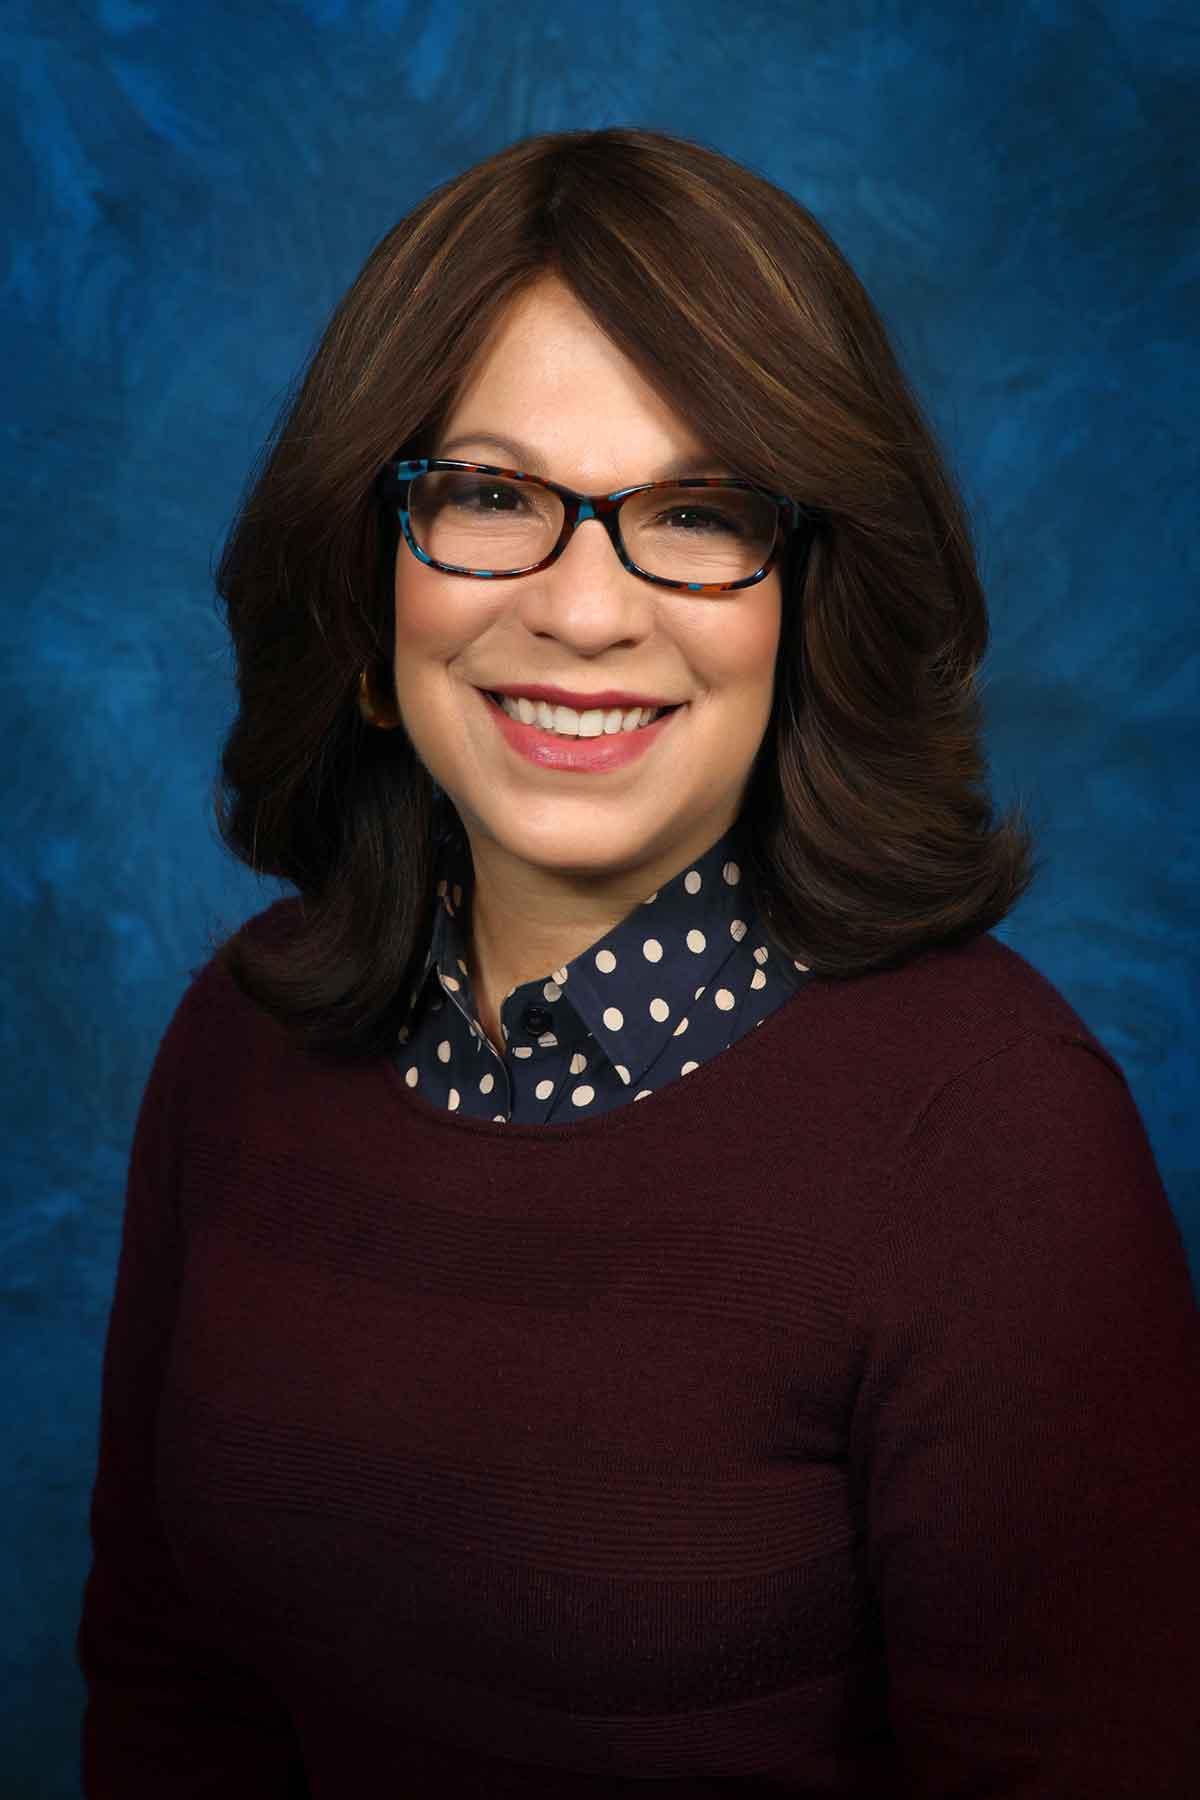 Rachel Rabinovitch, University of Colorado Anschutz Medical Campus